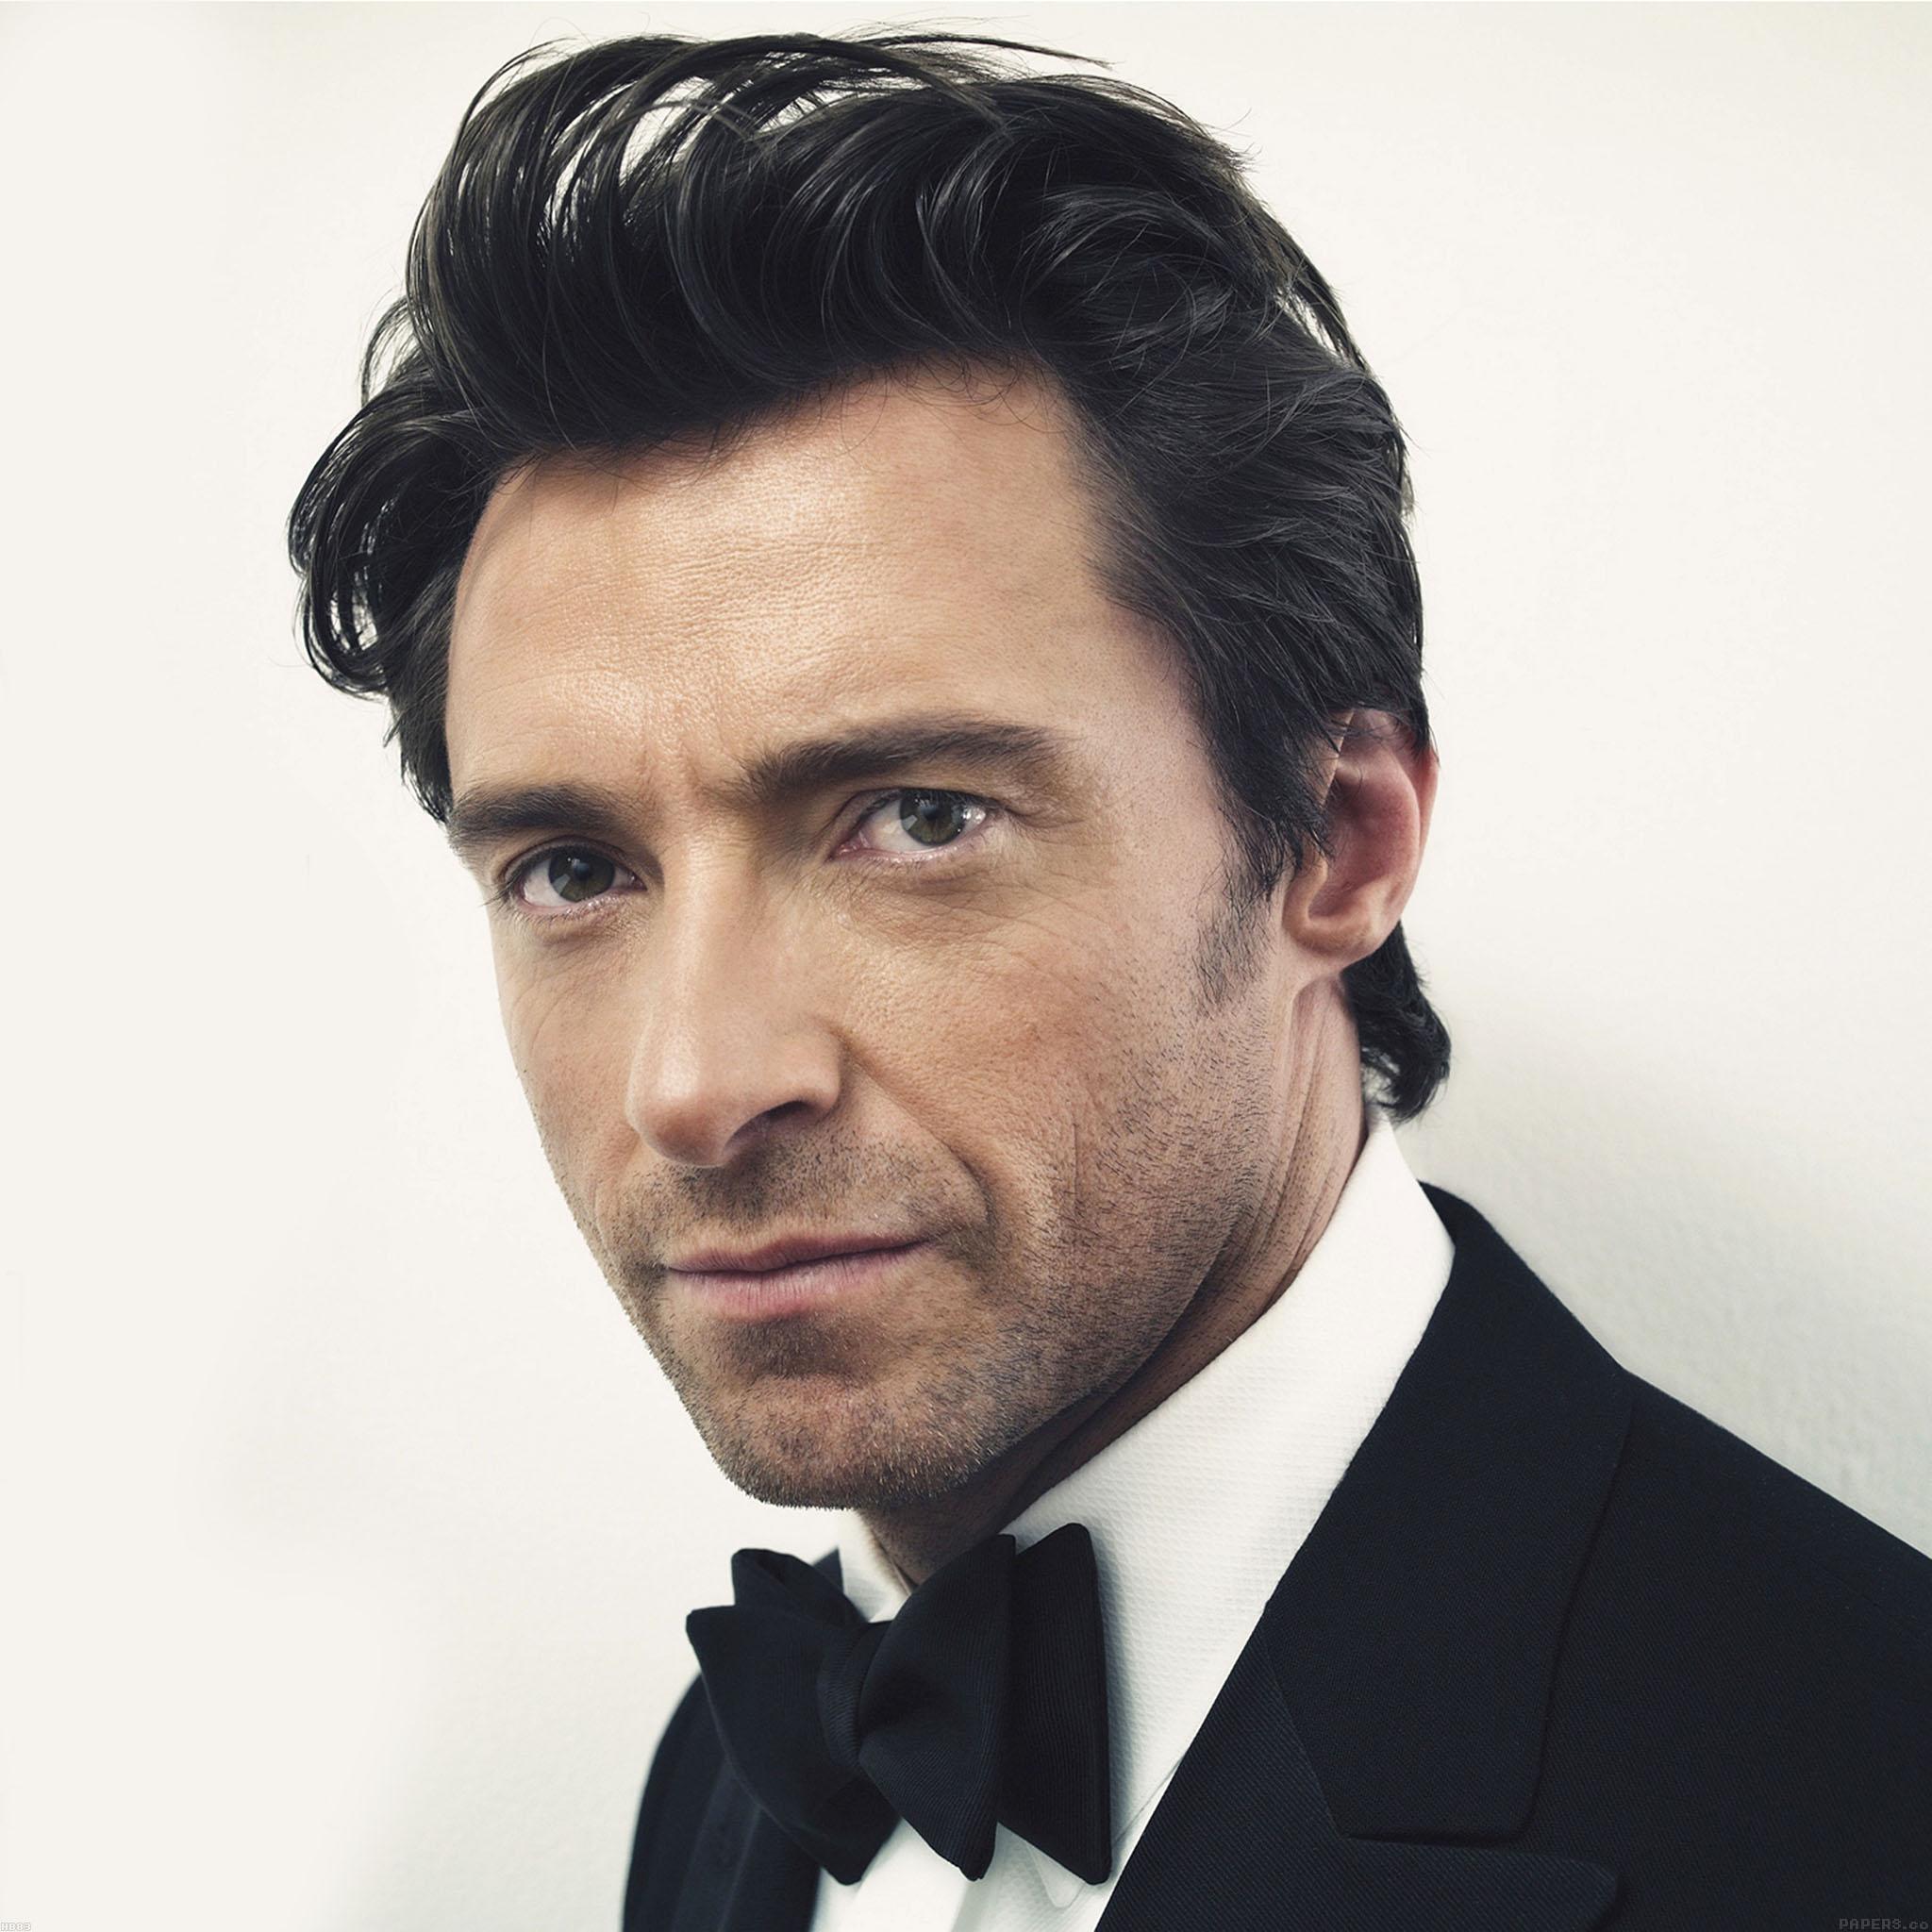 Причёски 30-х годов фото мужчины